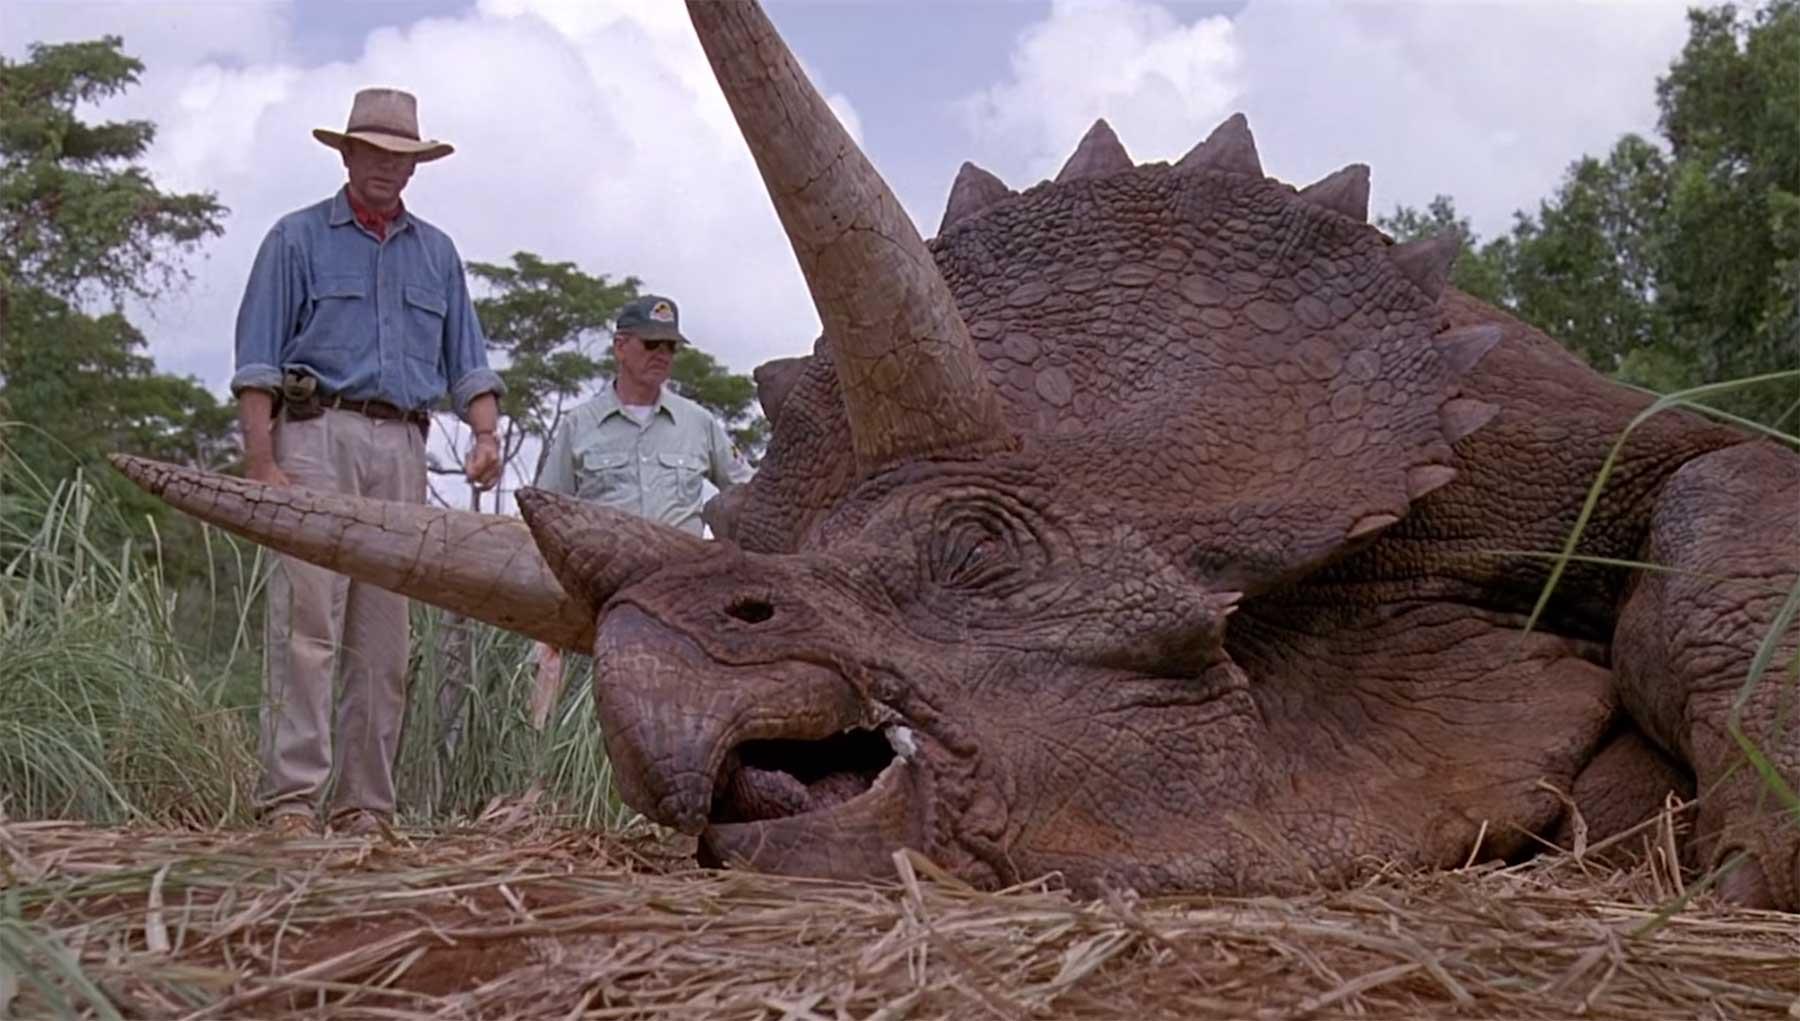 Experte erklärt alle Jurassic Park-Dinosaurier dinosaurier-in-jurassic-park-erklaert